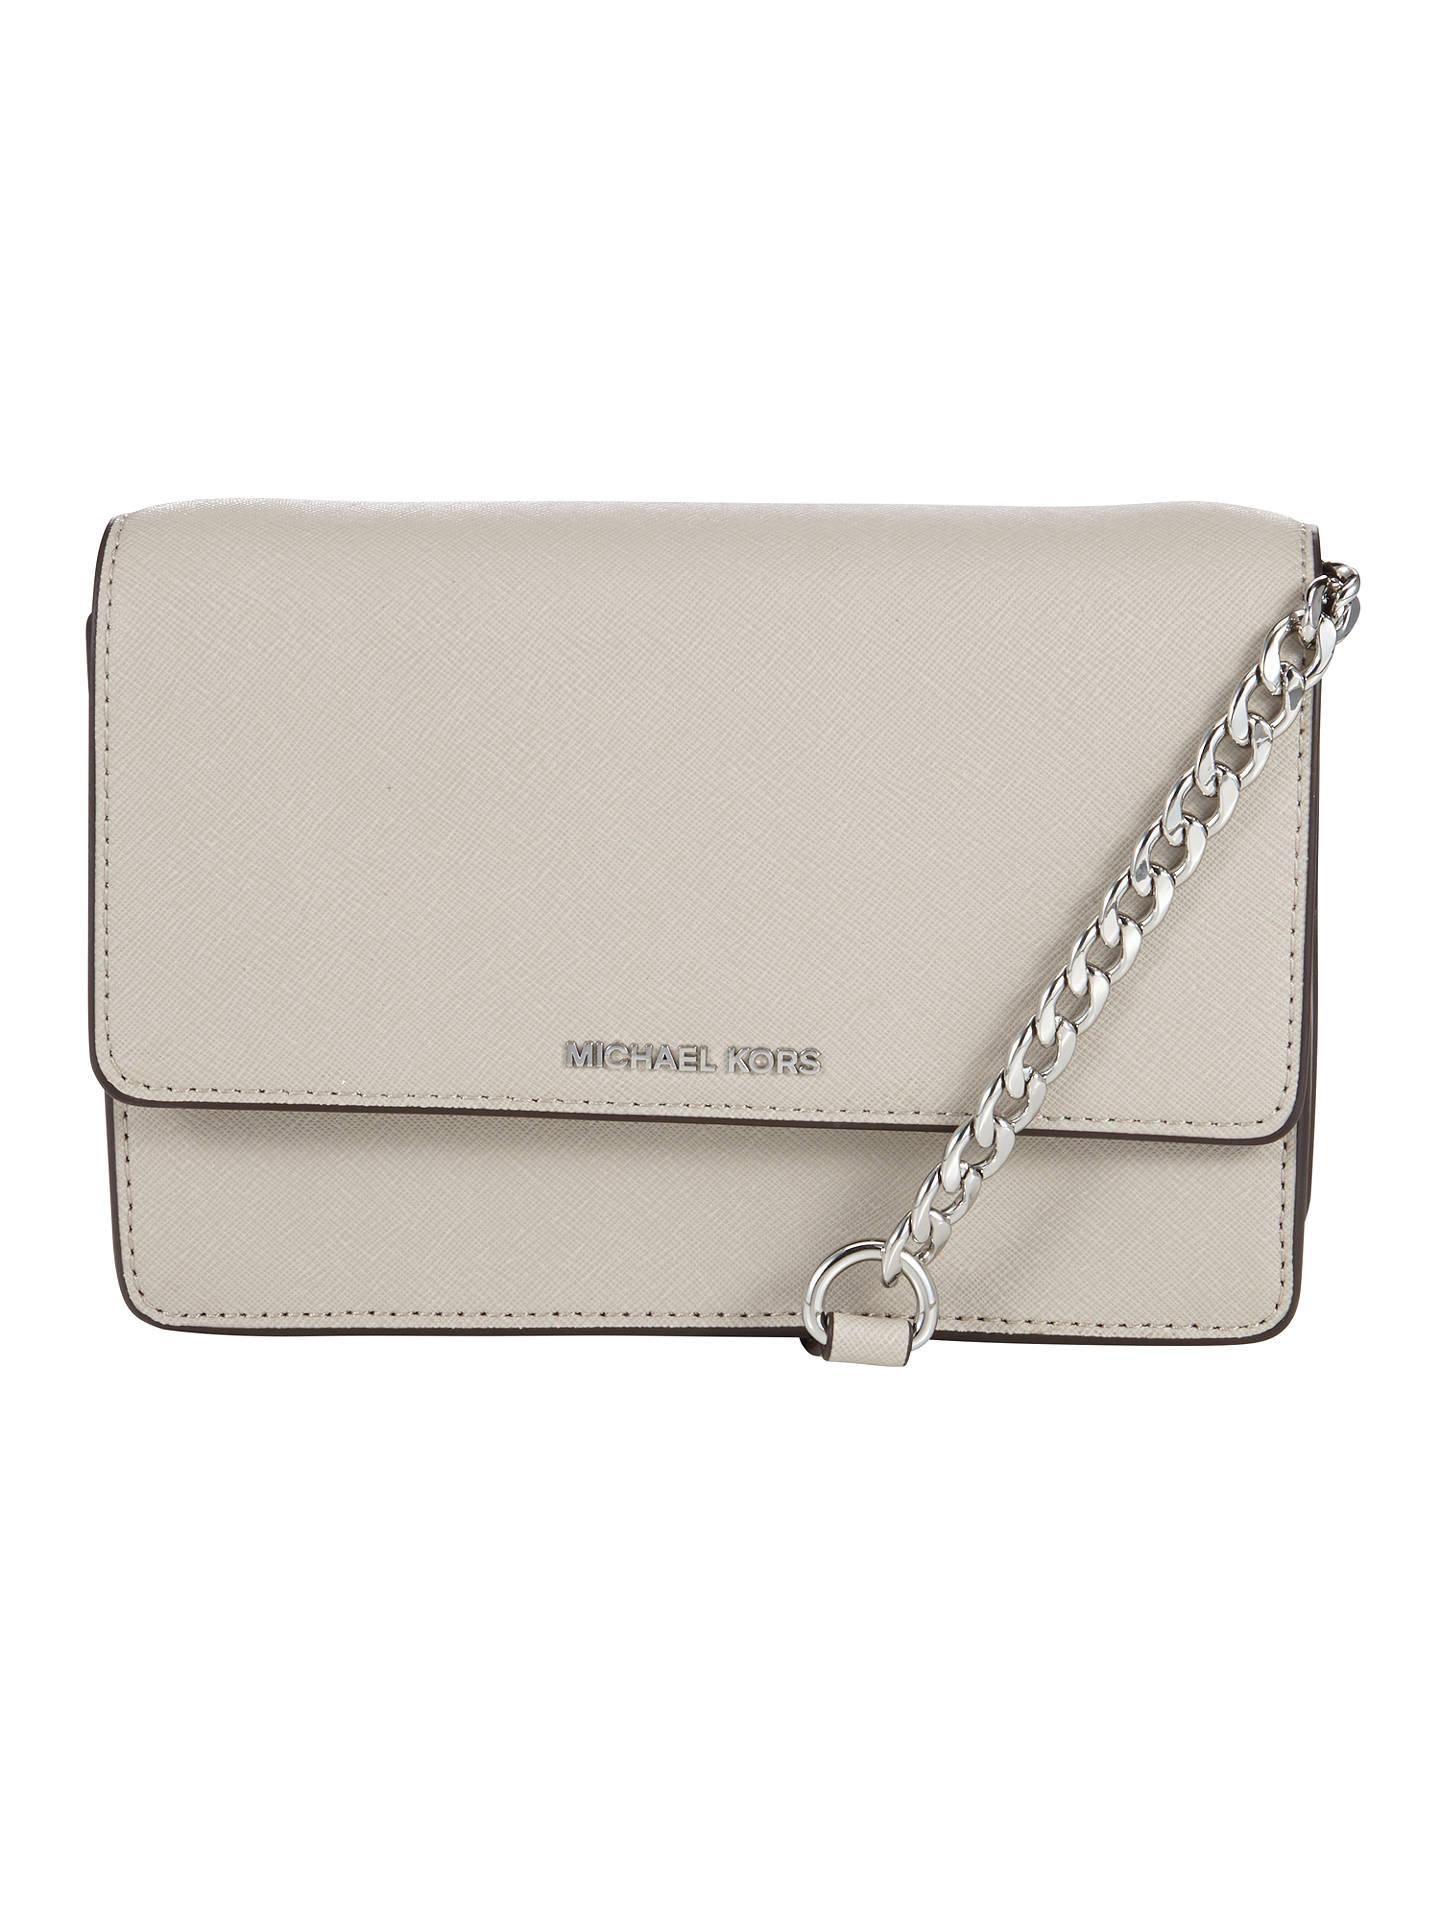 c79cfa356 Buy MICHAEL Michael Kors Daniela Small Leather Across Body Bag, Cement  Online at johnlewis.